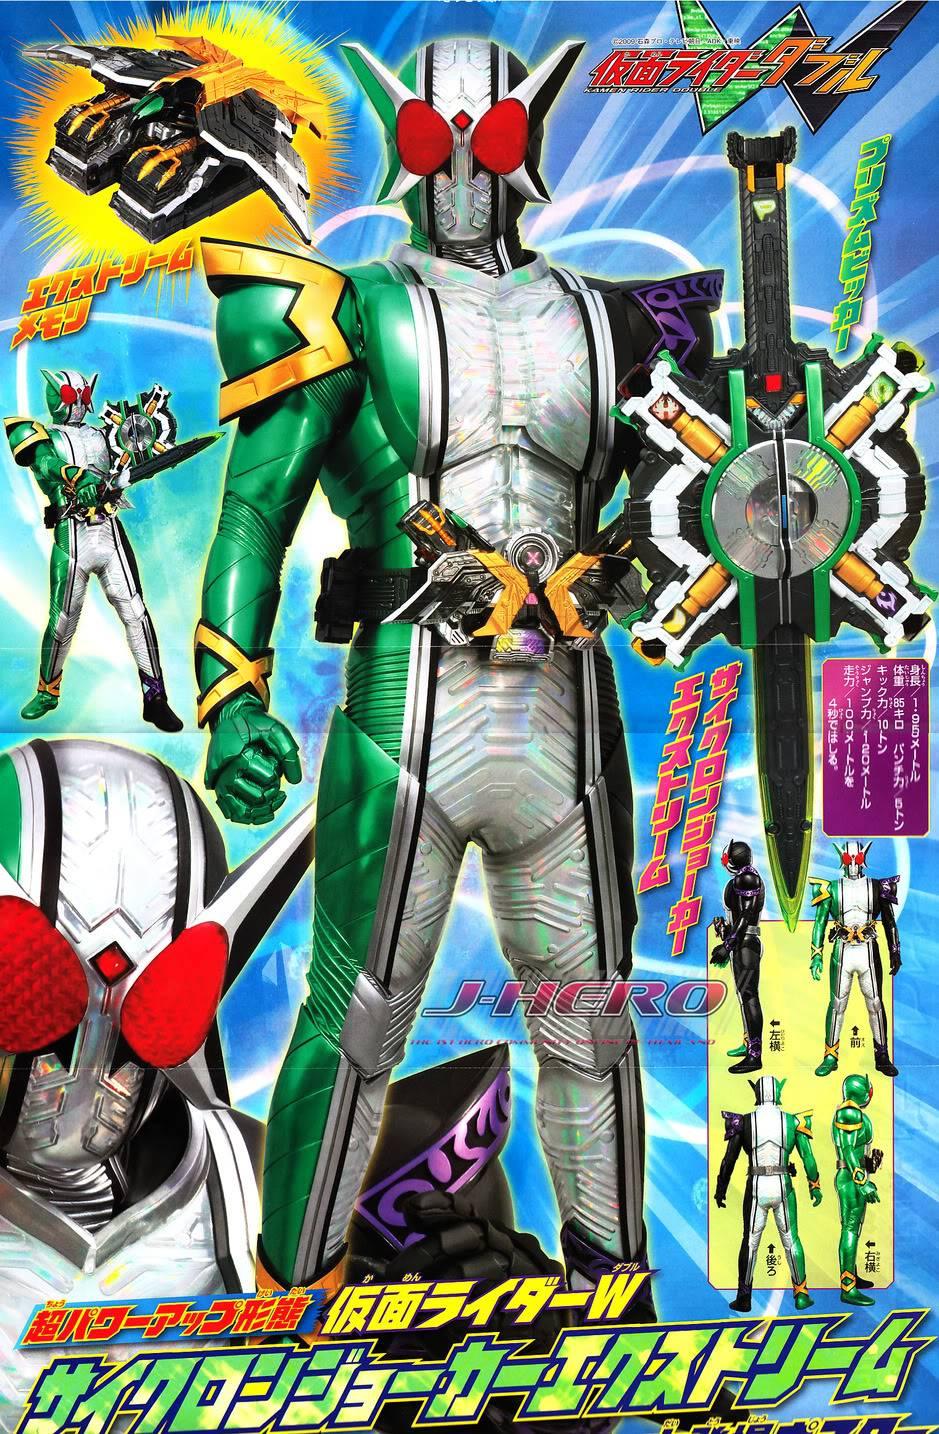 Kamen Rider W - Page 3 Telebi05W06